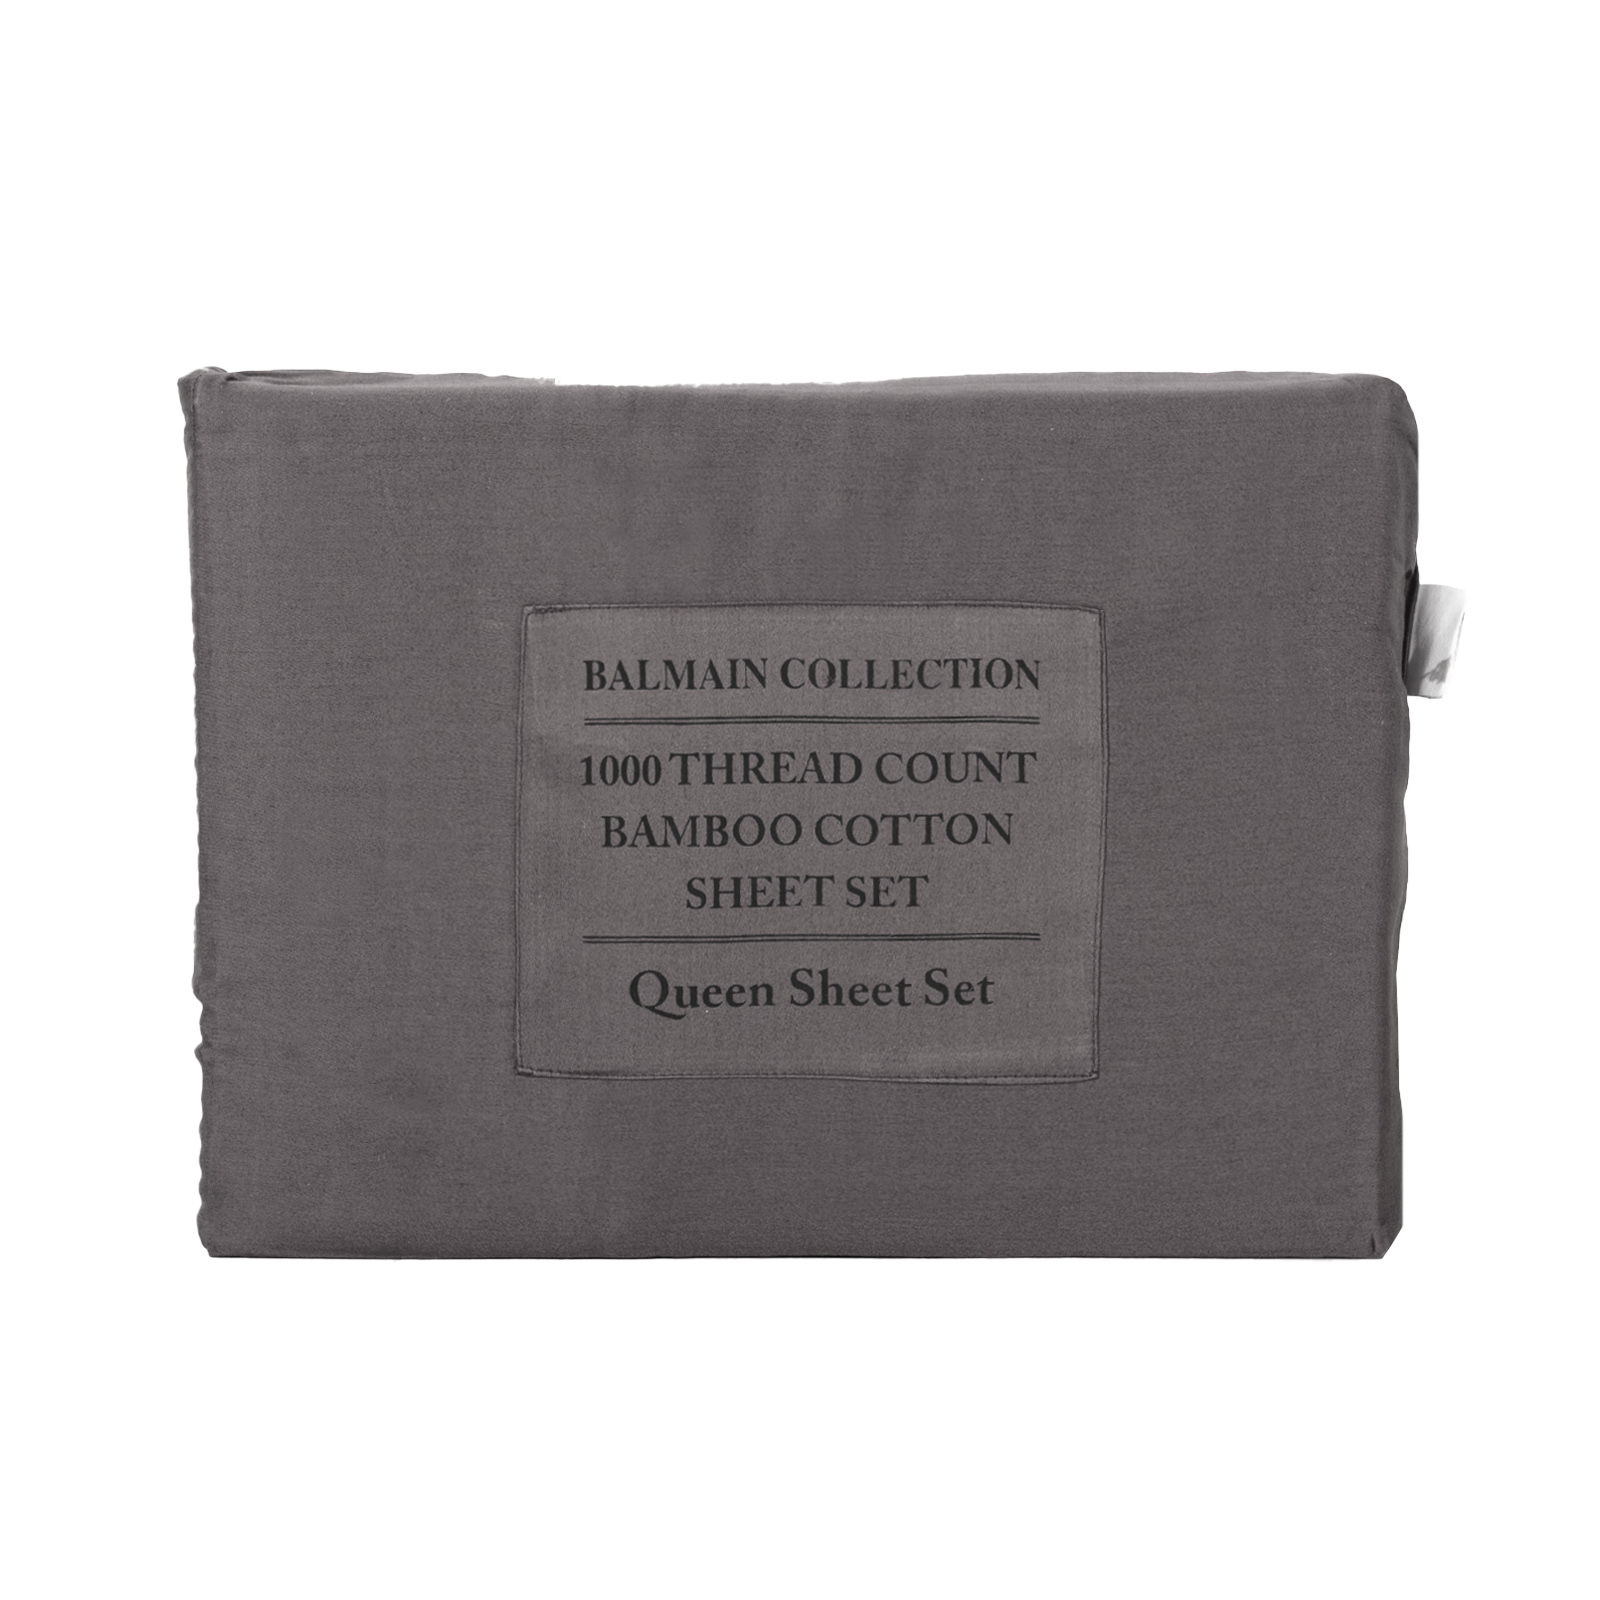 thumbnail 61 - Royal Comfort 1000TC Hotel Grade Bamboo Cotton Sheets Pillowcases Set Ultrasoft